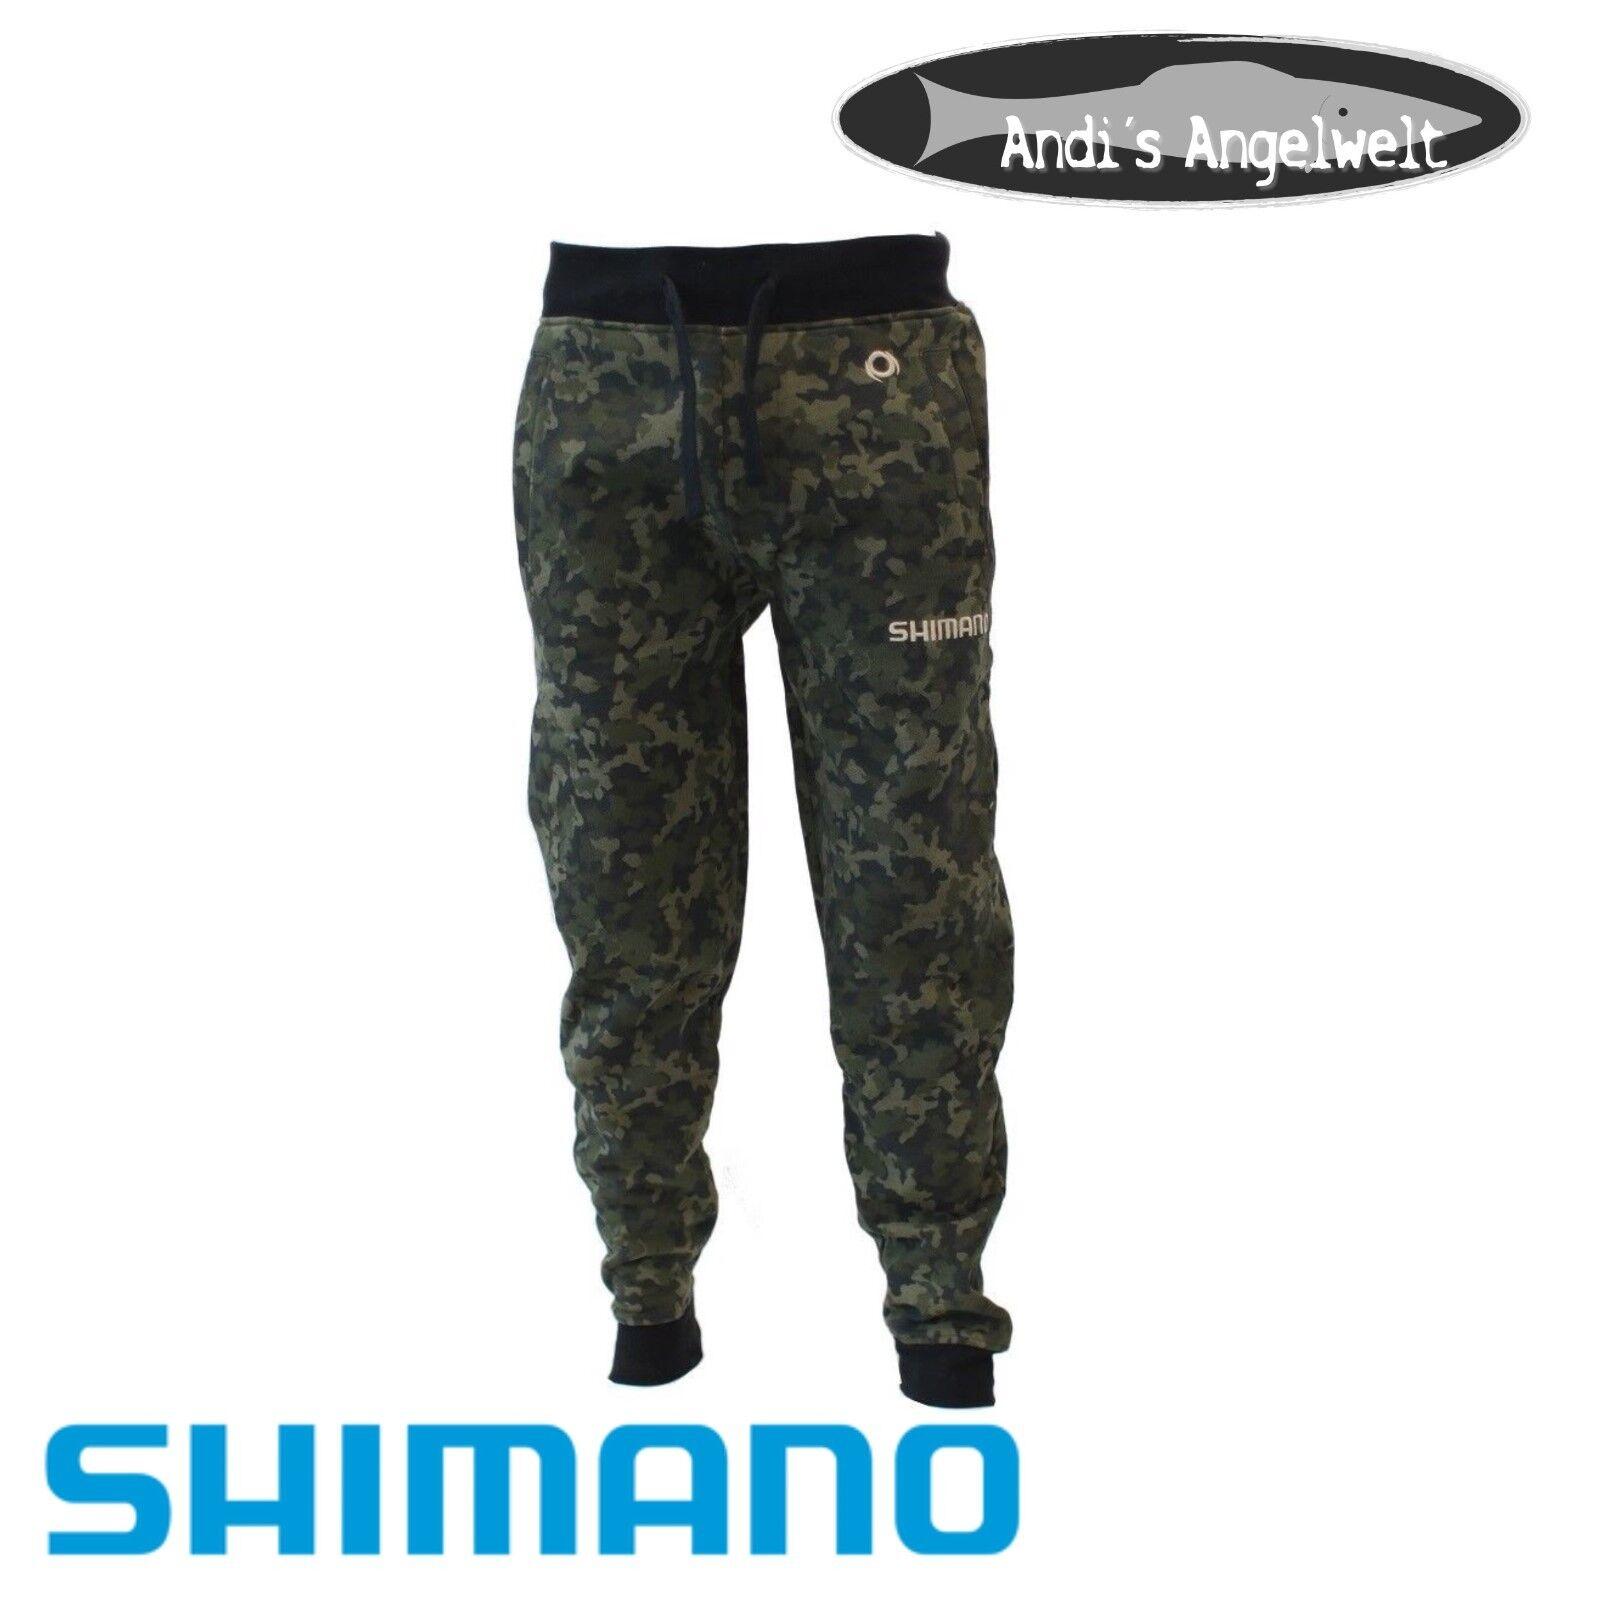 Shimano Tribal XTR Pents - Jogginghose - Anglerhose -  M   L   XL   XXL   3XL